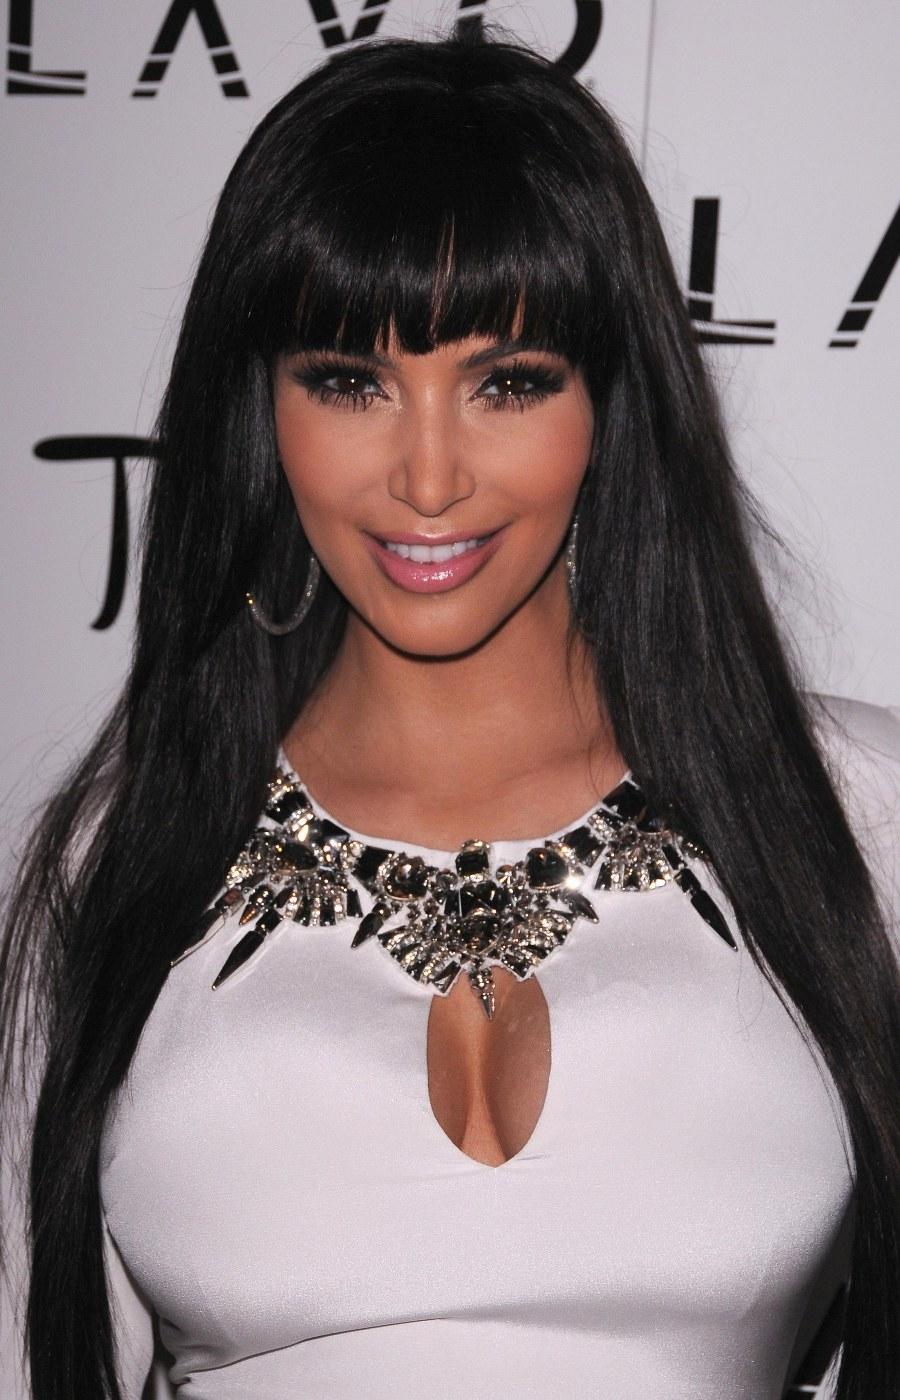 kim-kardashian-photoshoot-2012-3